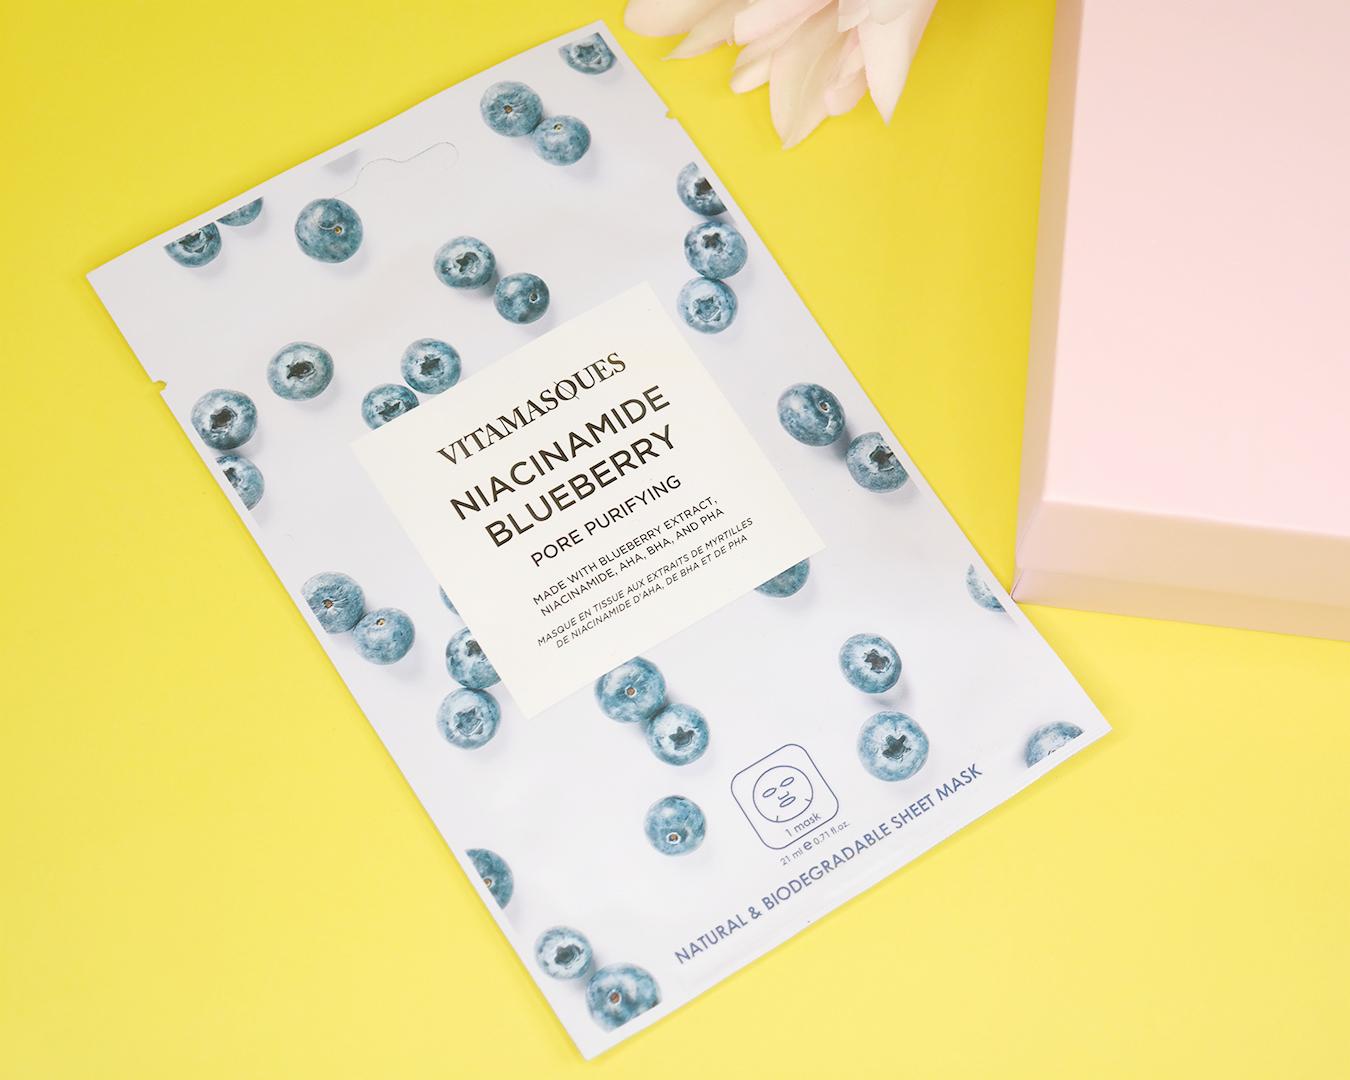 Vitamasques Niacinamide Blueberry Sheet Mask